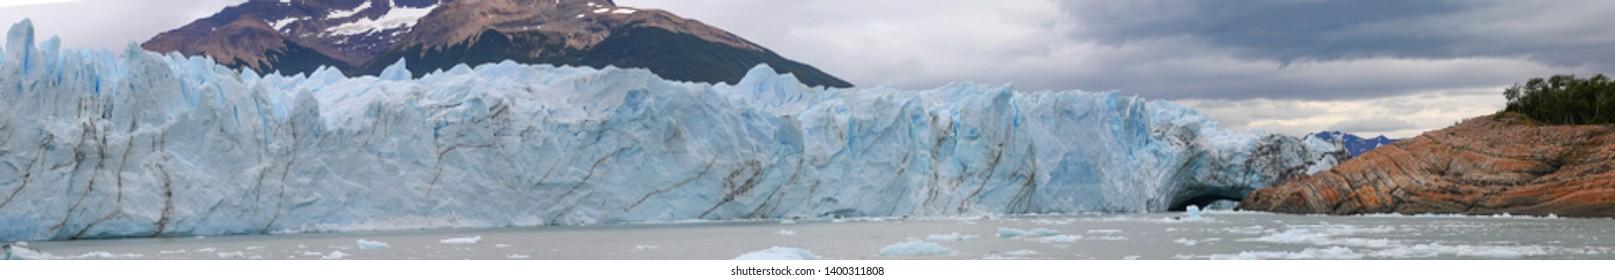 Panoramic view on the Perito Moreno Glacier. Glacier located in the Los Glaciares National Park in Santa Cruz Province, Argentina. Patagonia.